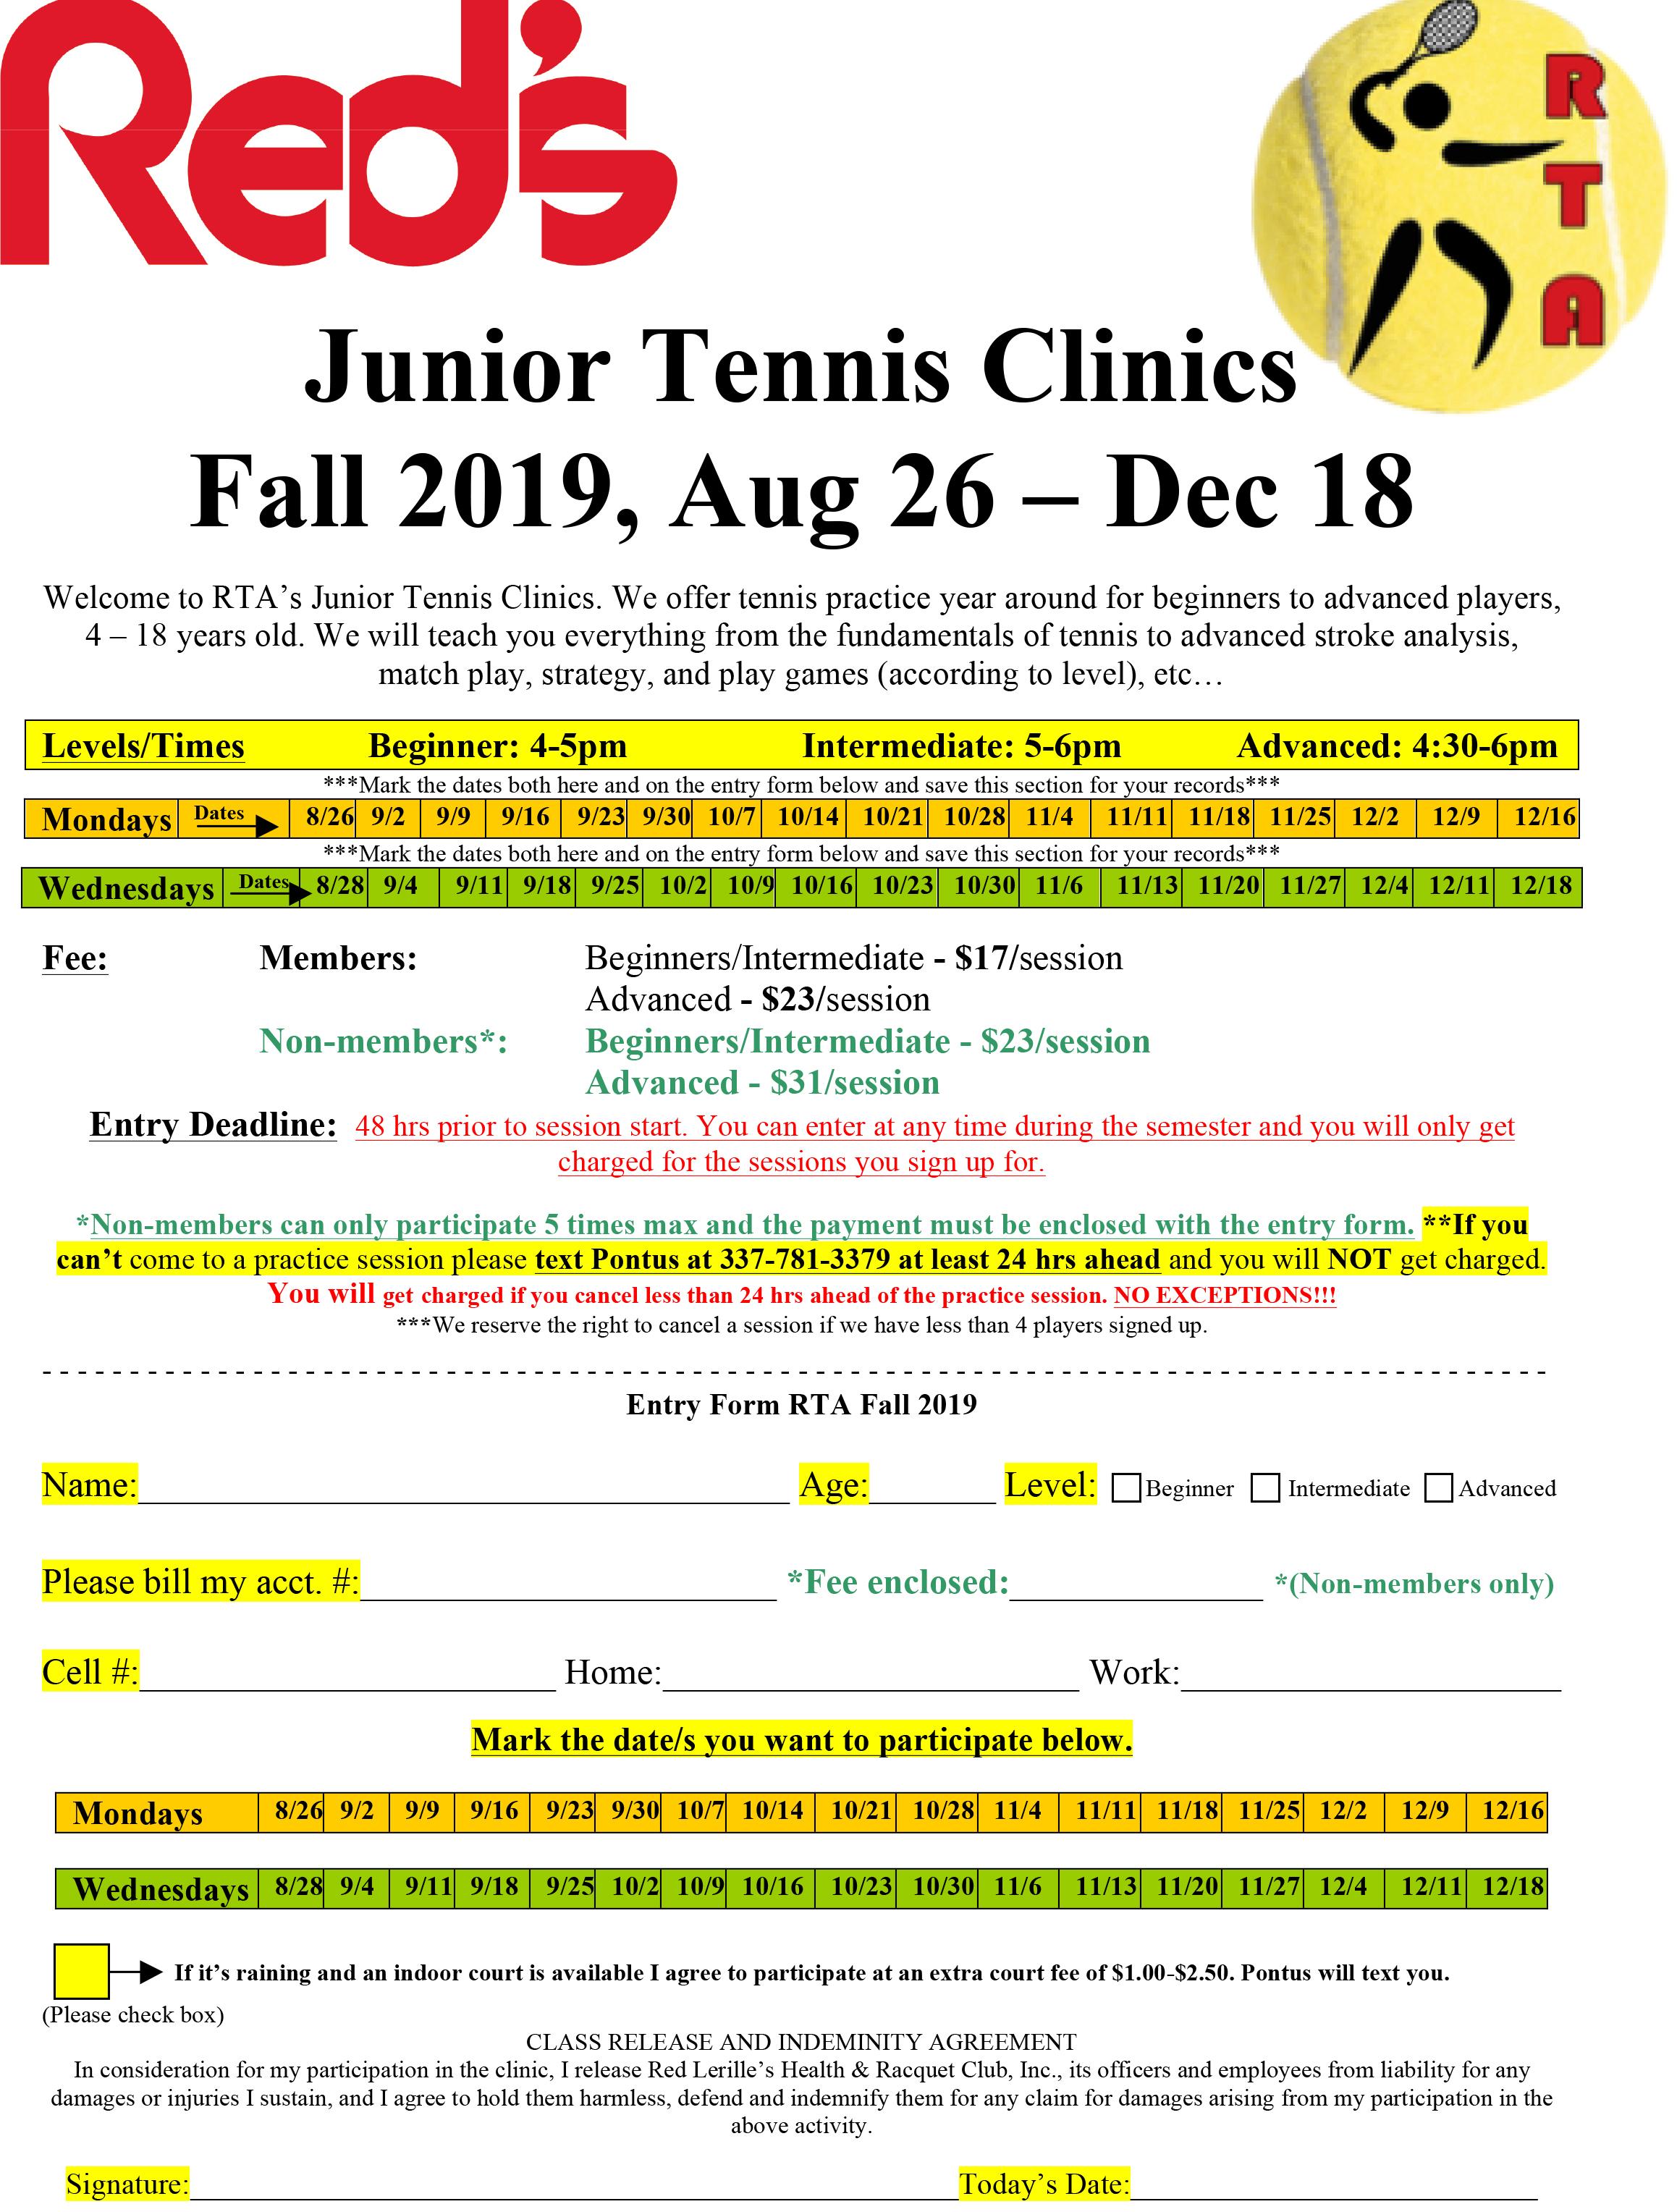 Red's Junior Tennis Clinics Fall 2019